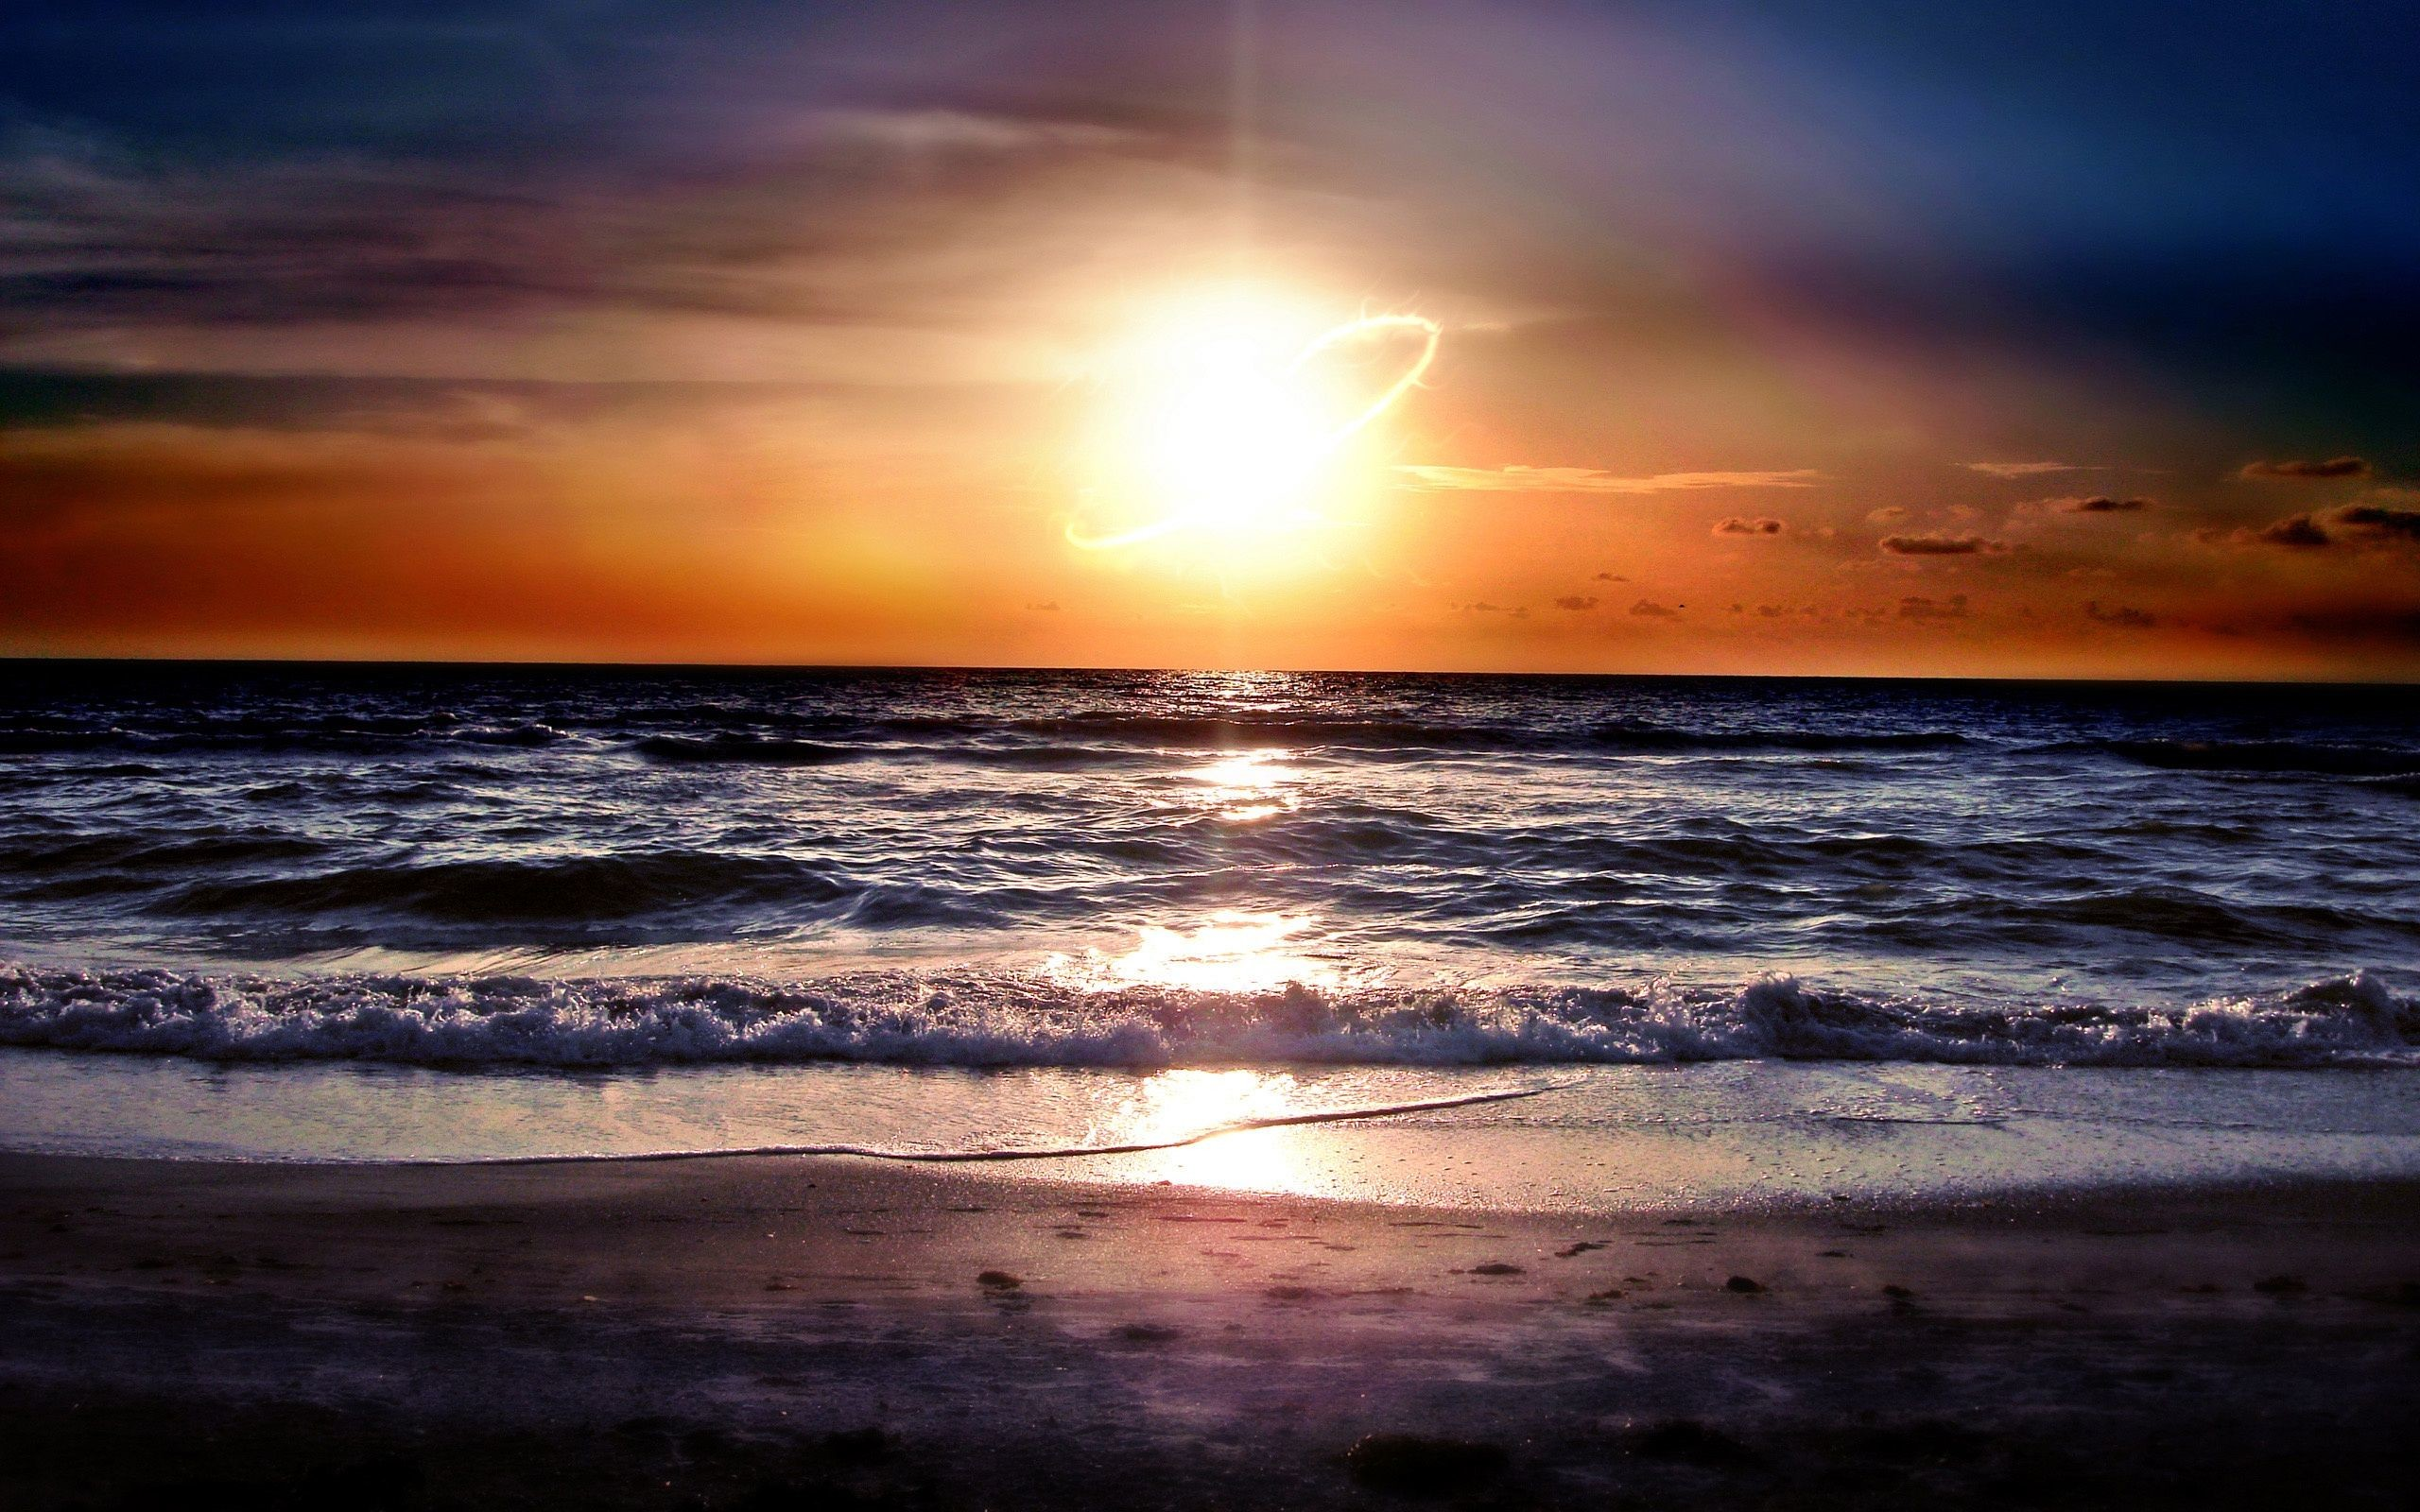 Ocean Sunset Wallpaper 1